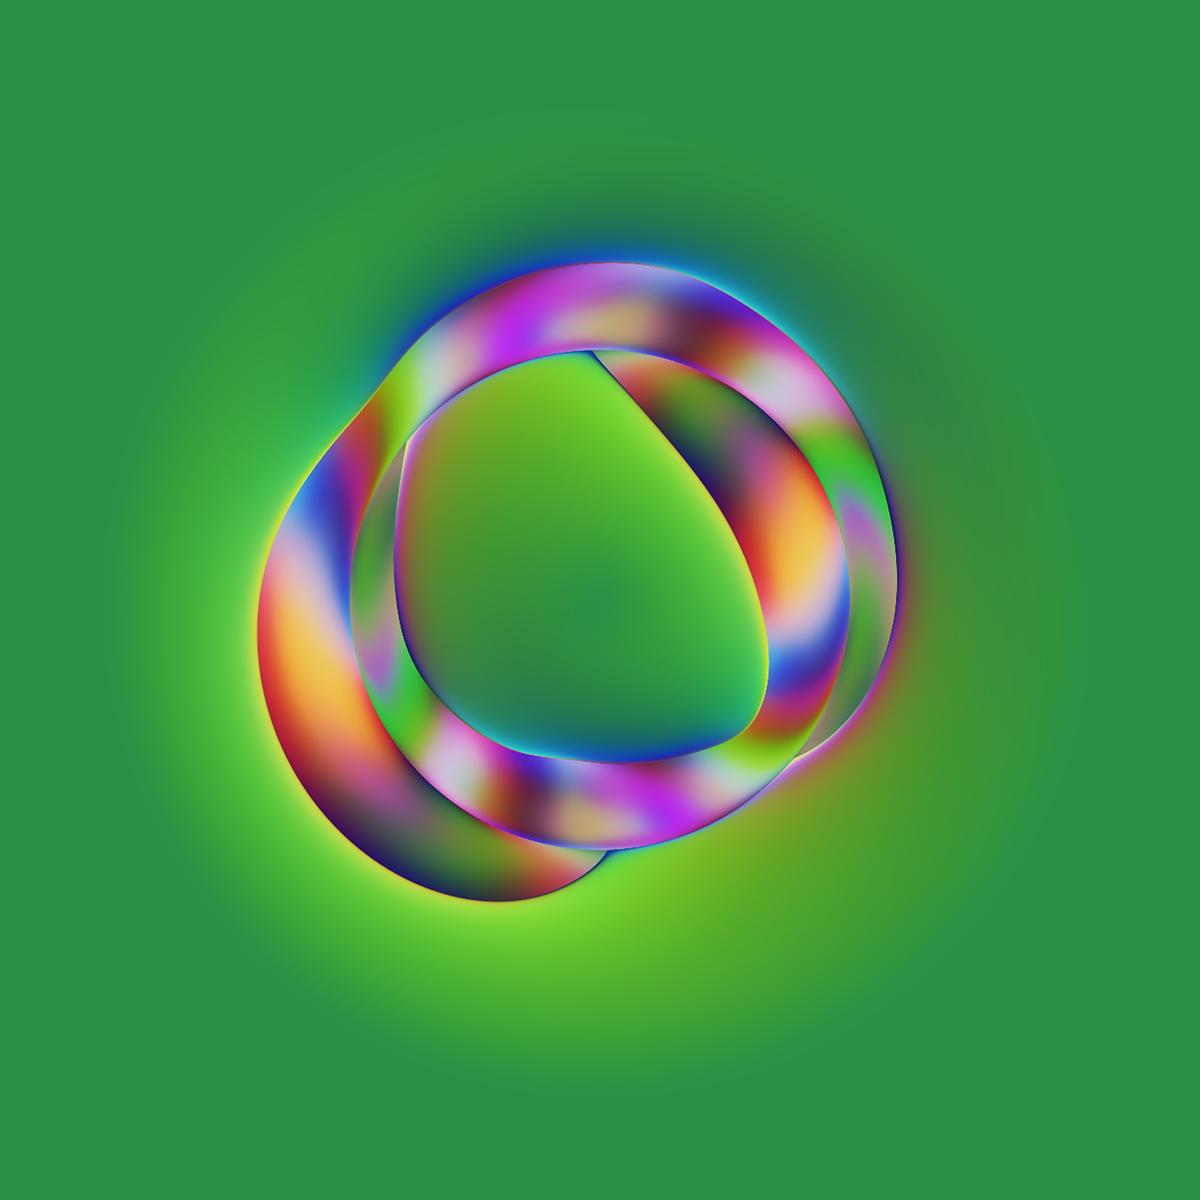 Image may contain: screenshot, colorfulness and art